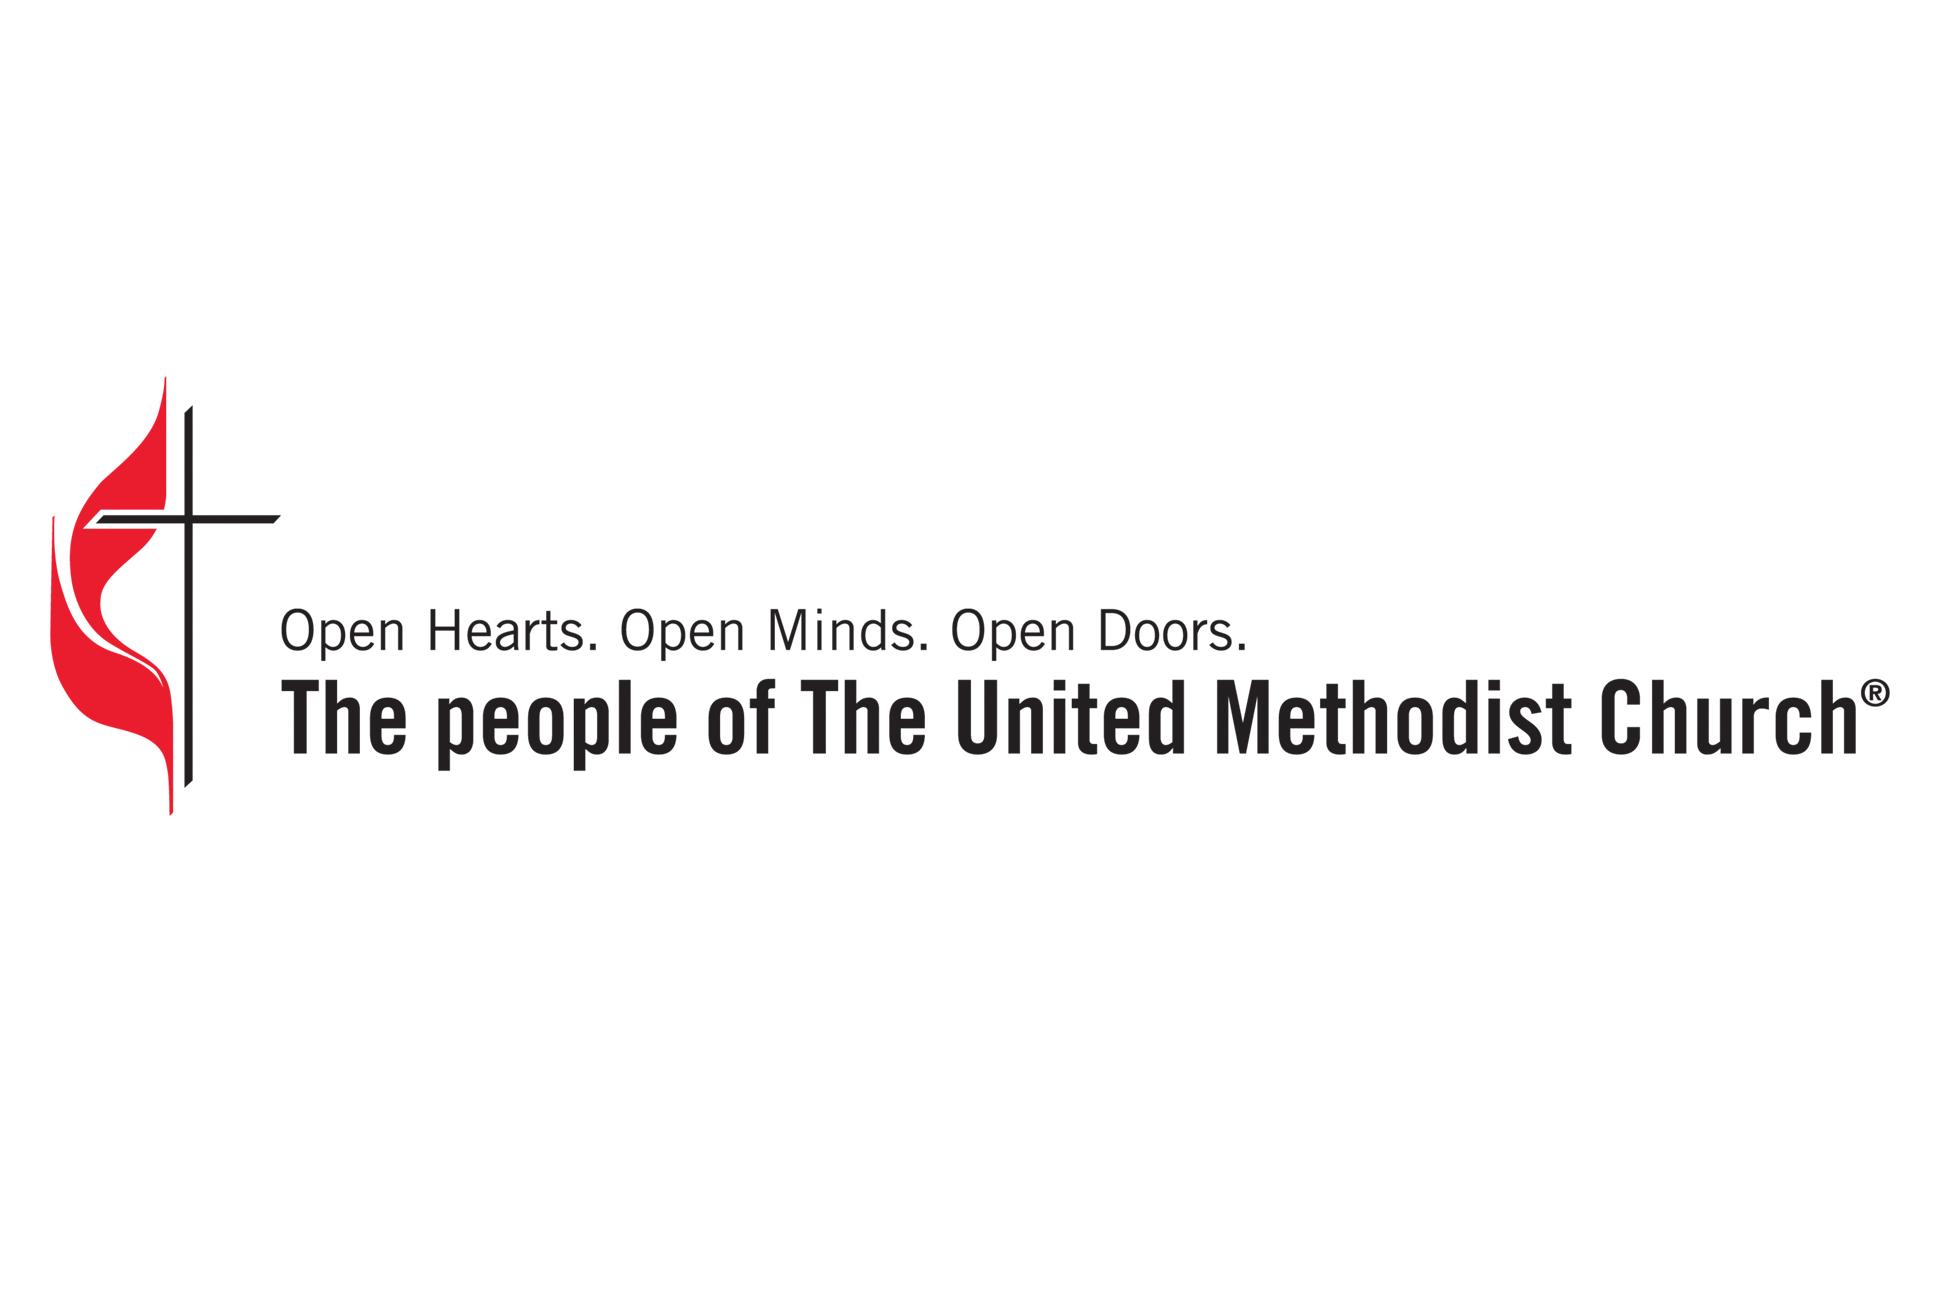 United Methodist Church brand promise logo, 3x2 ratio.